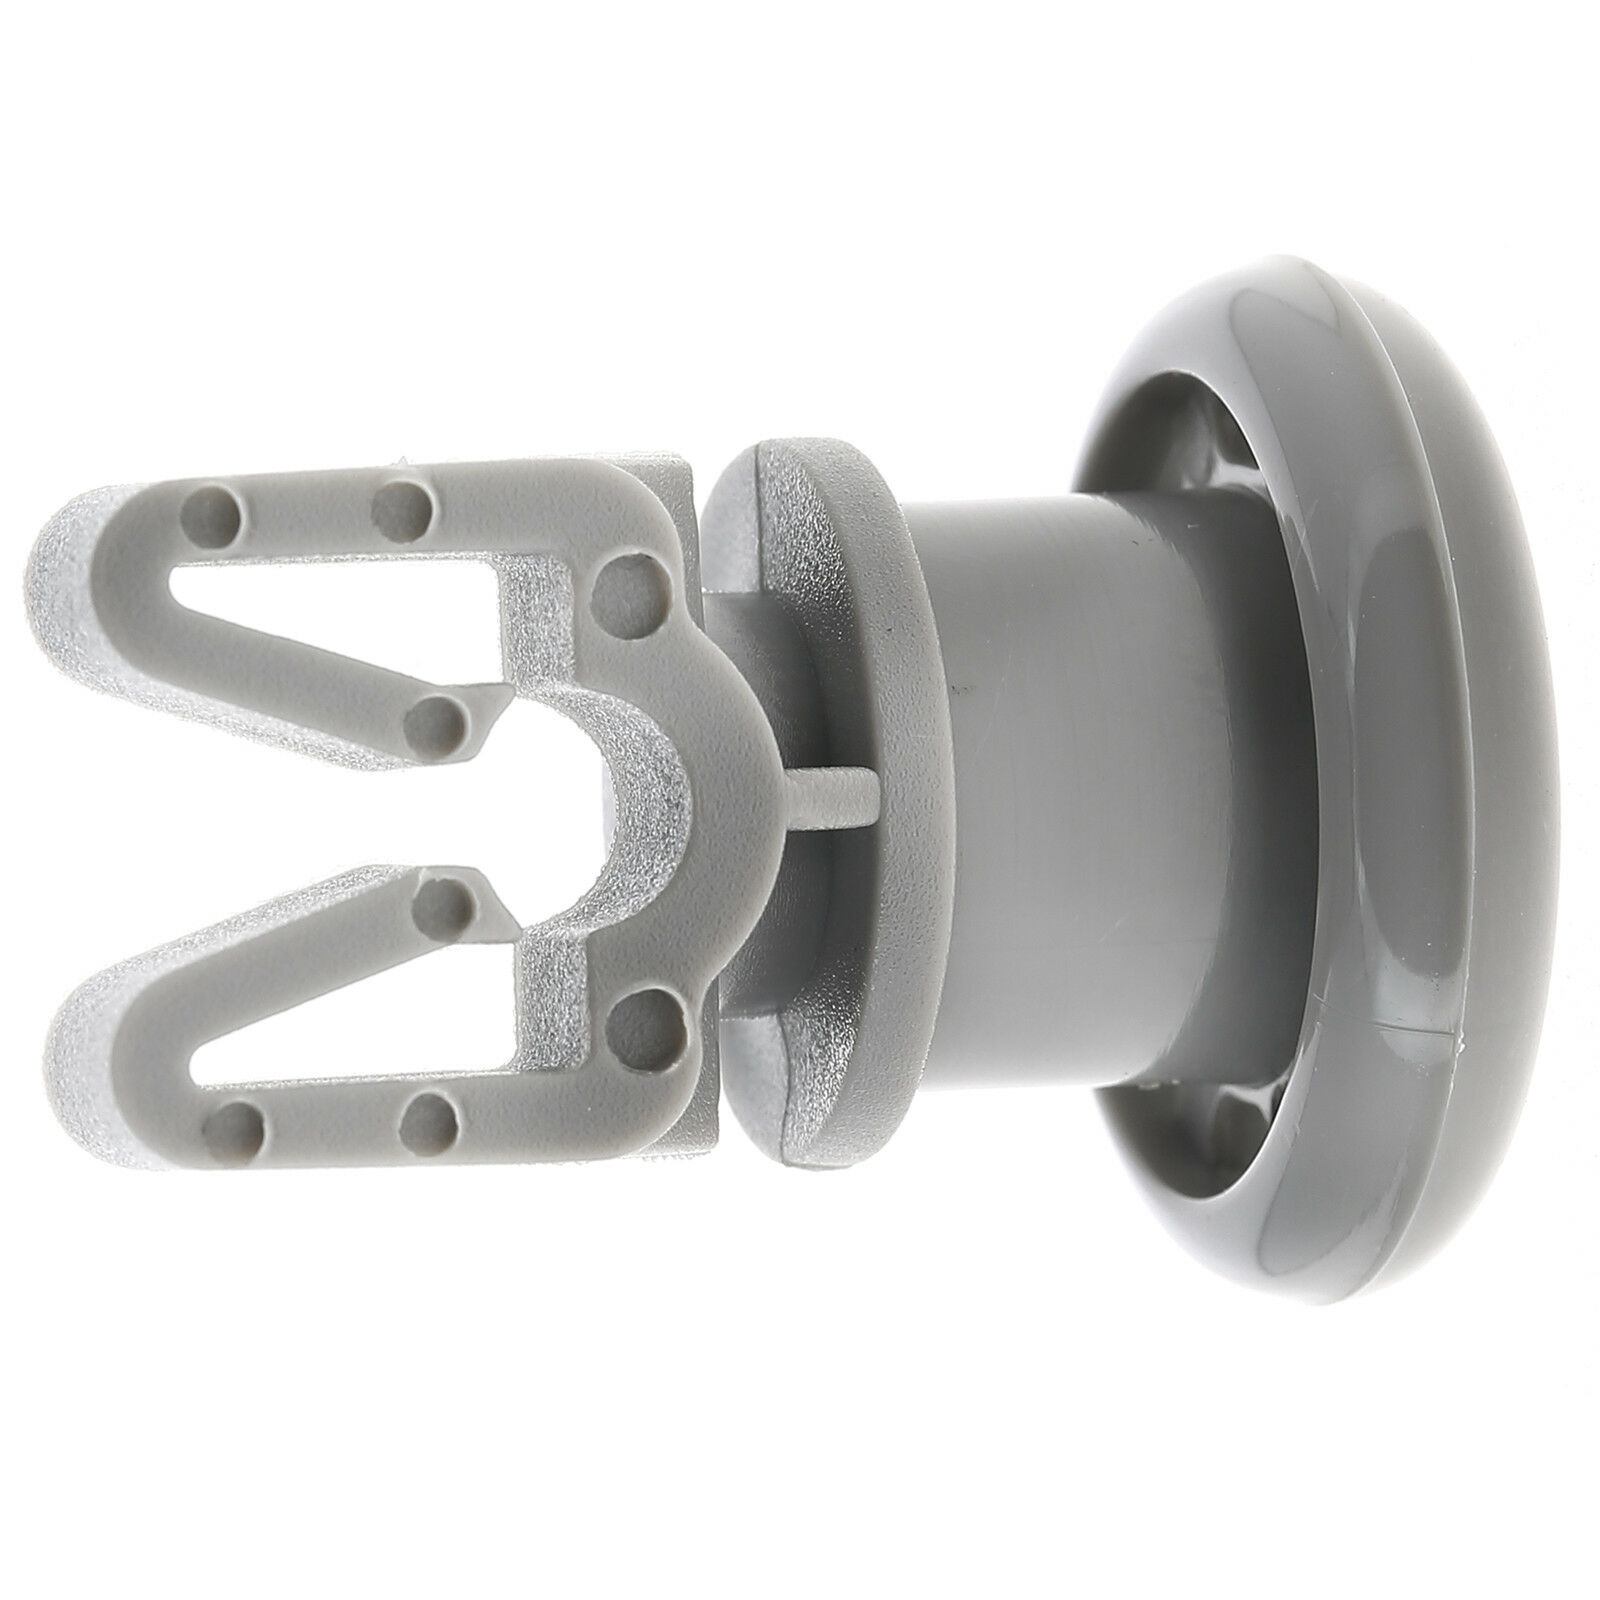 8 X Beko Lamona Dishwasher Upper Top Basket Wheel Runner 1885800500